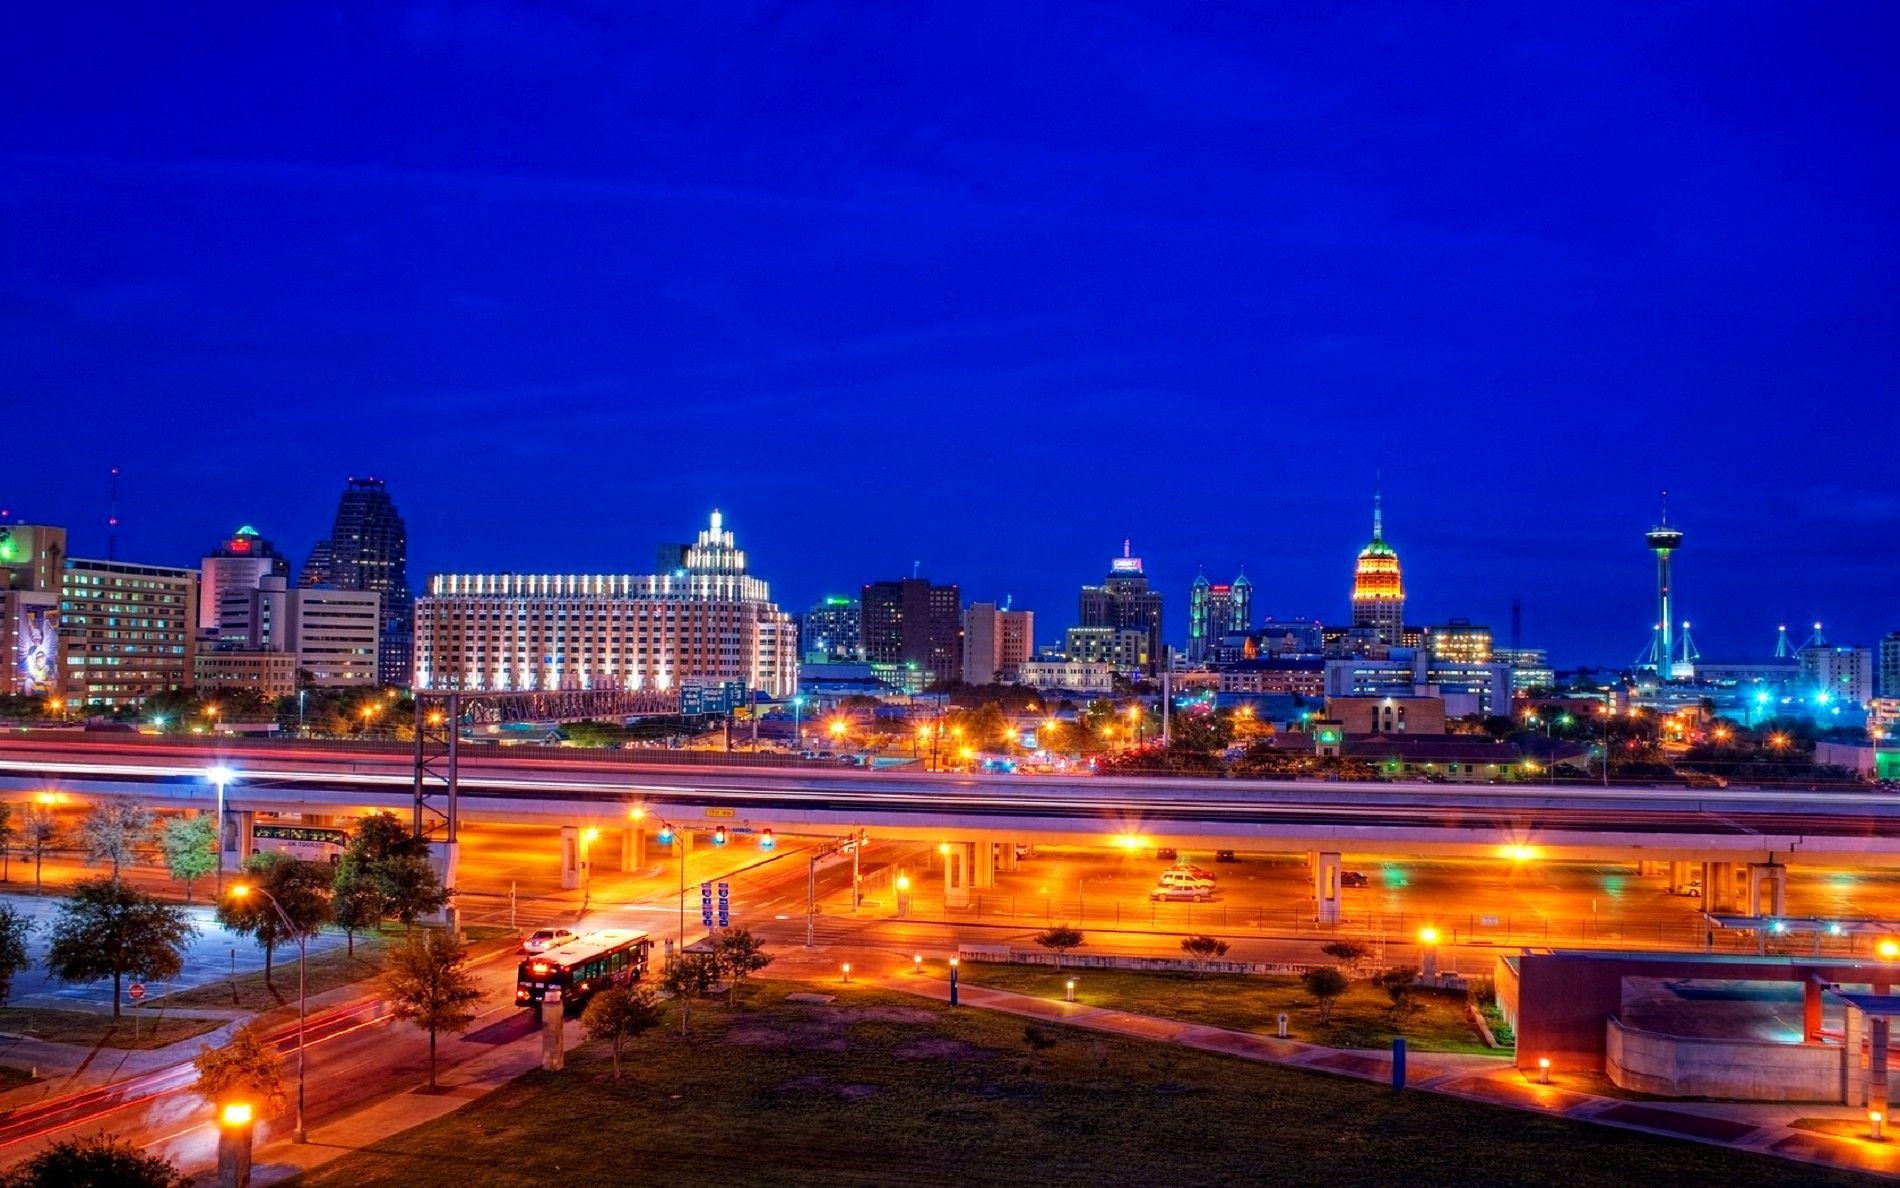 San Antonio City San Antonio Texas Night City Lights Wallpapers San Antonio City Cheap Hotels Places Around The World